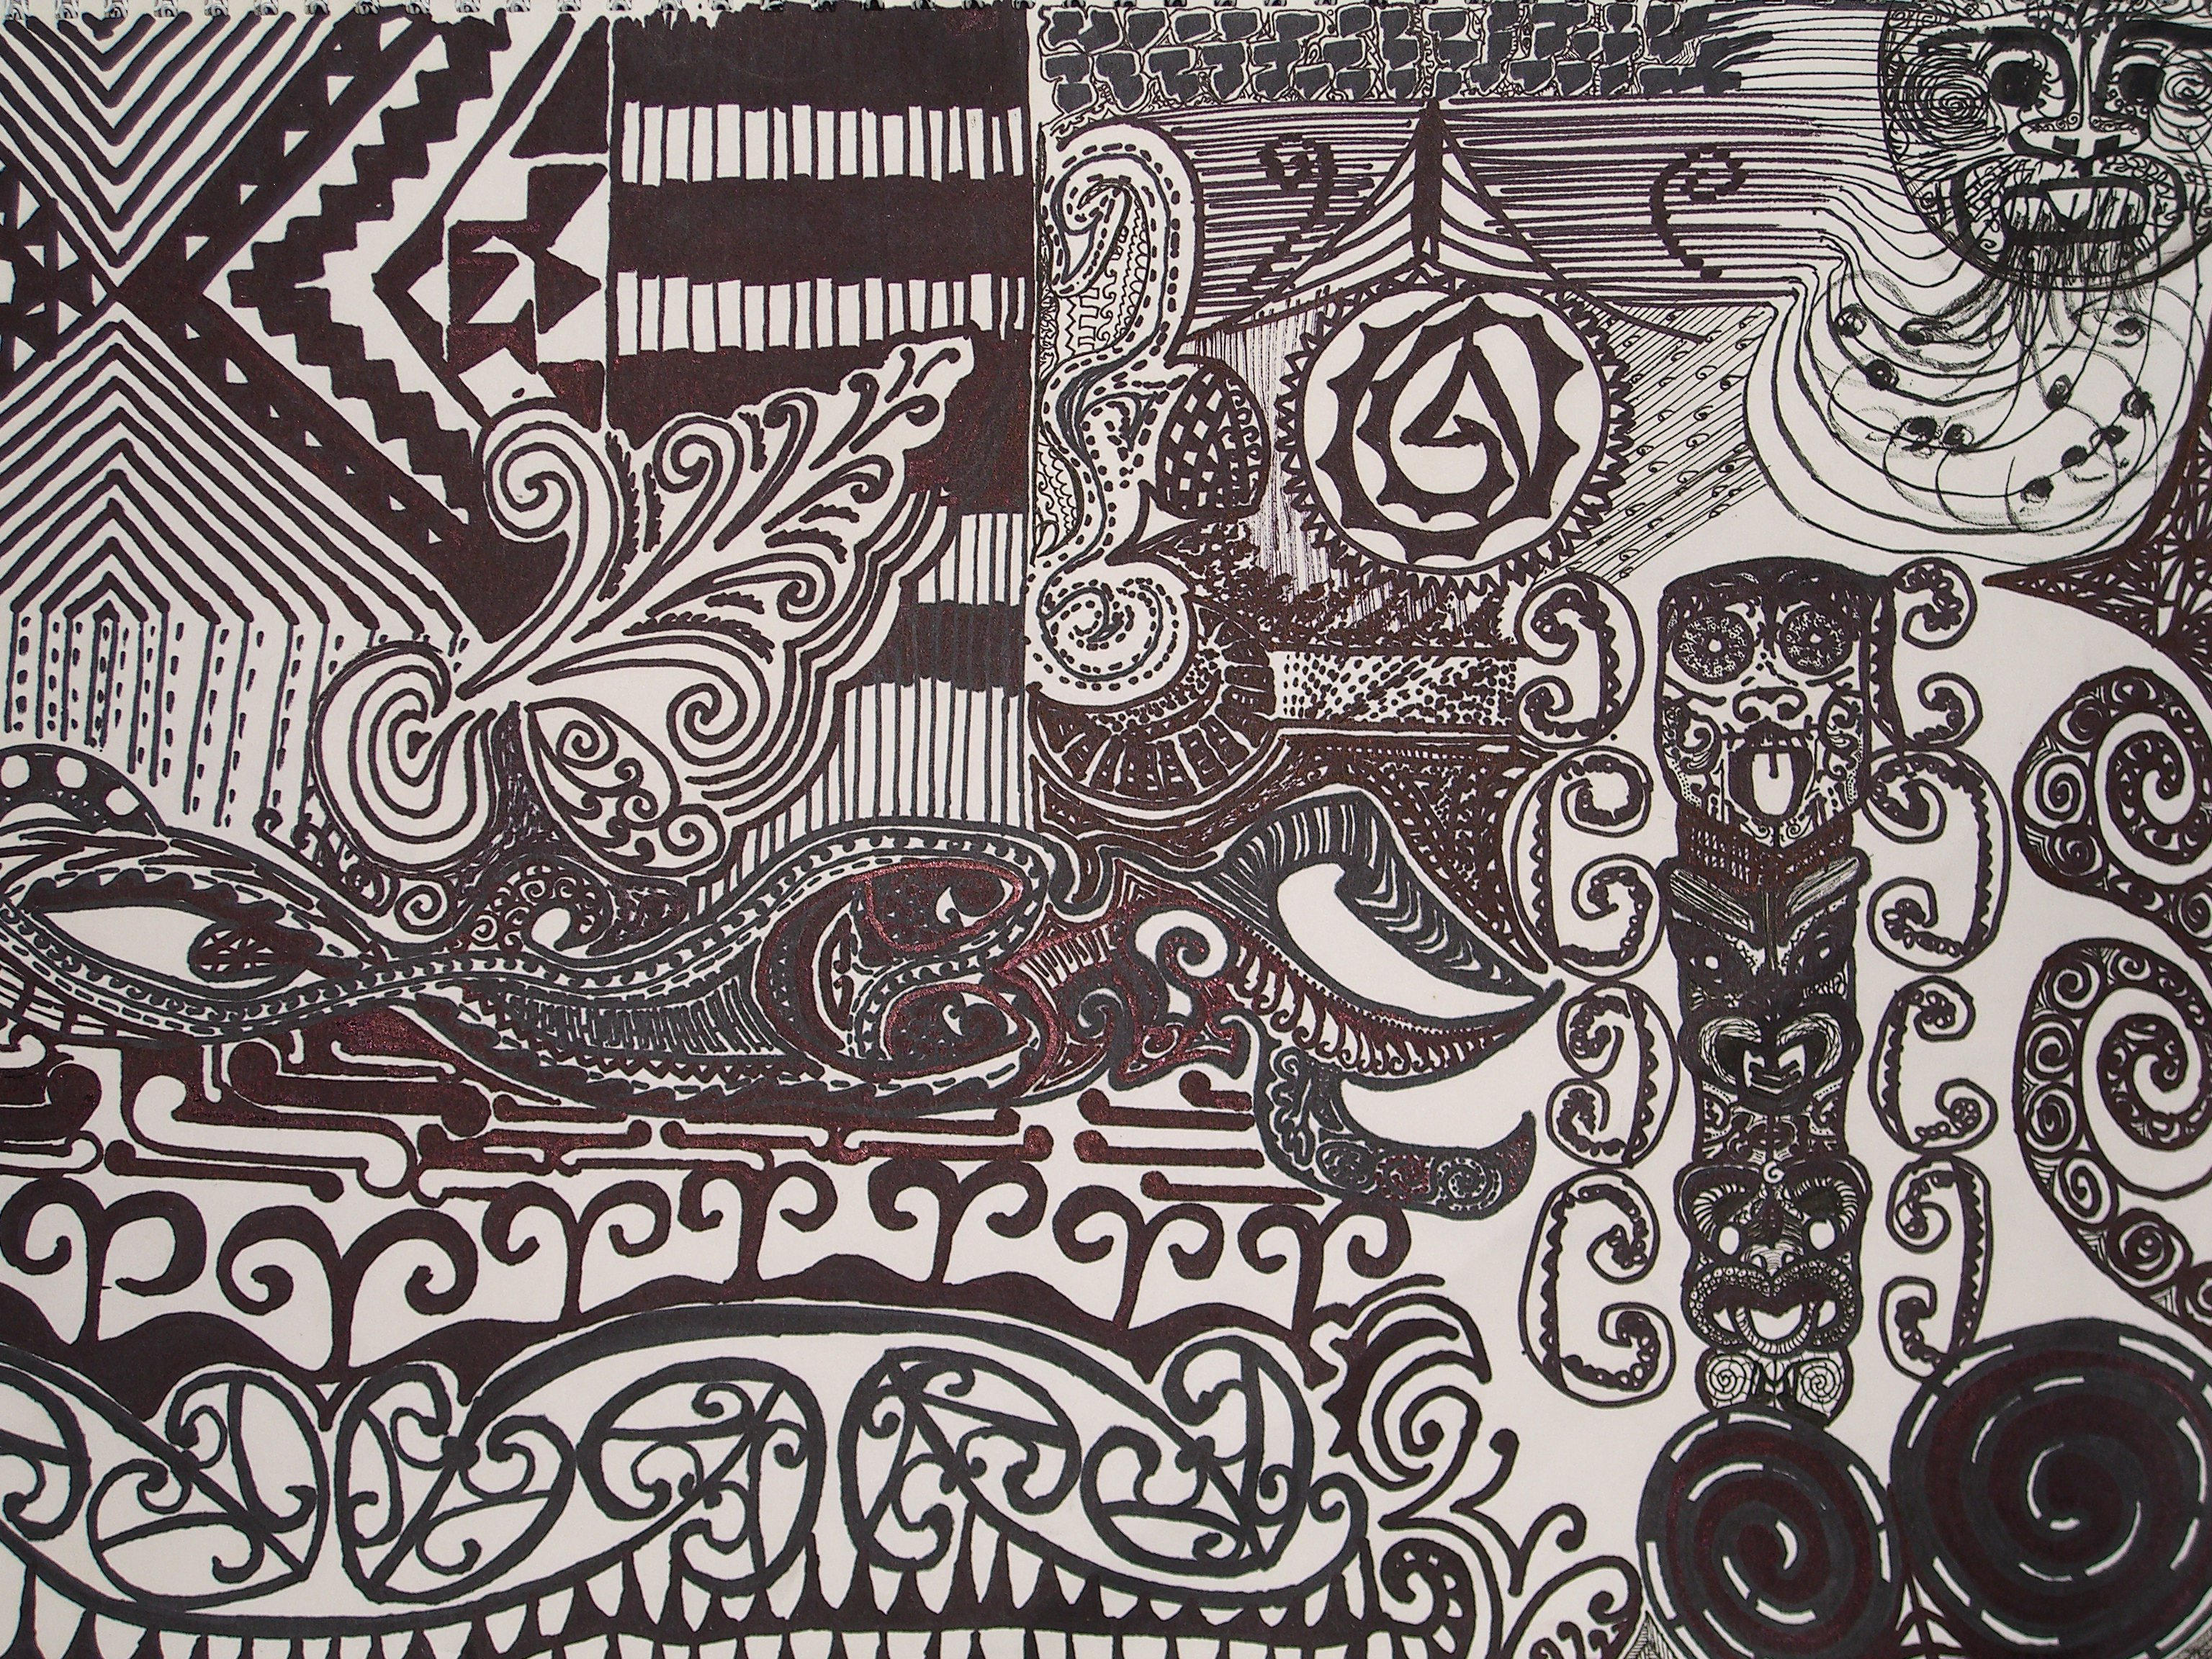 maori art iphone wallpaper - photo #2